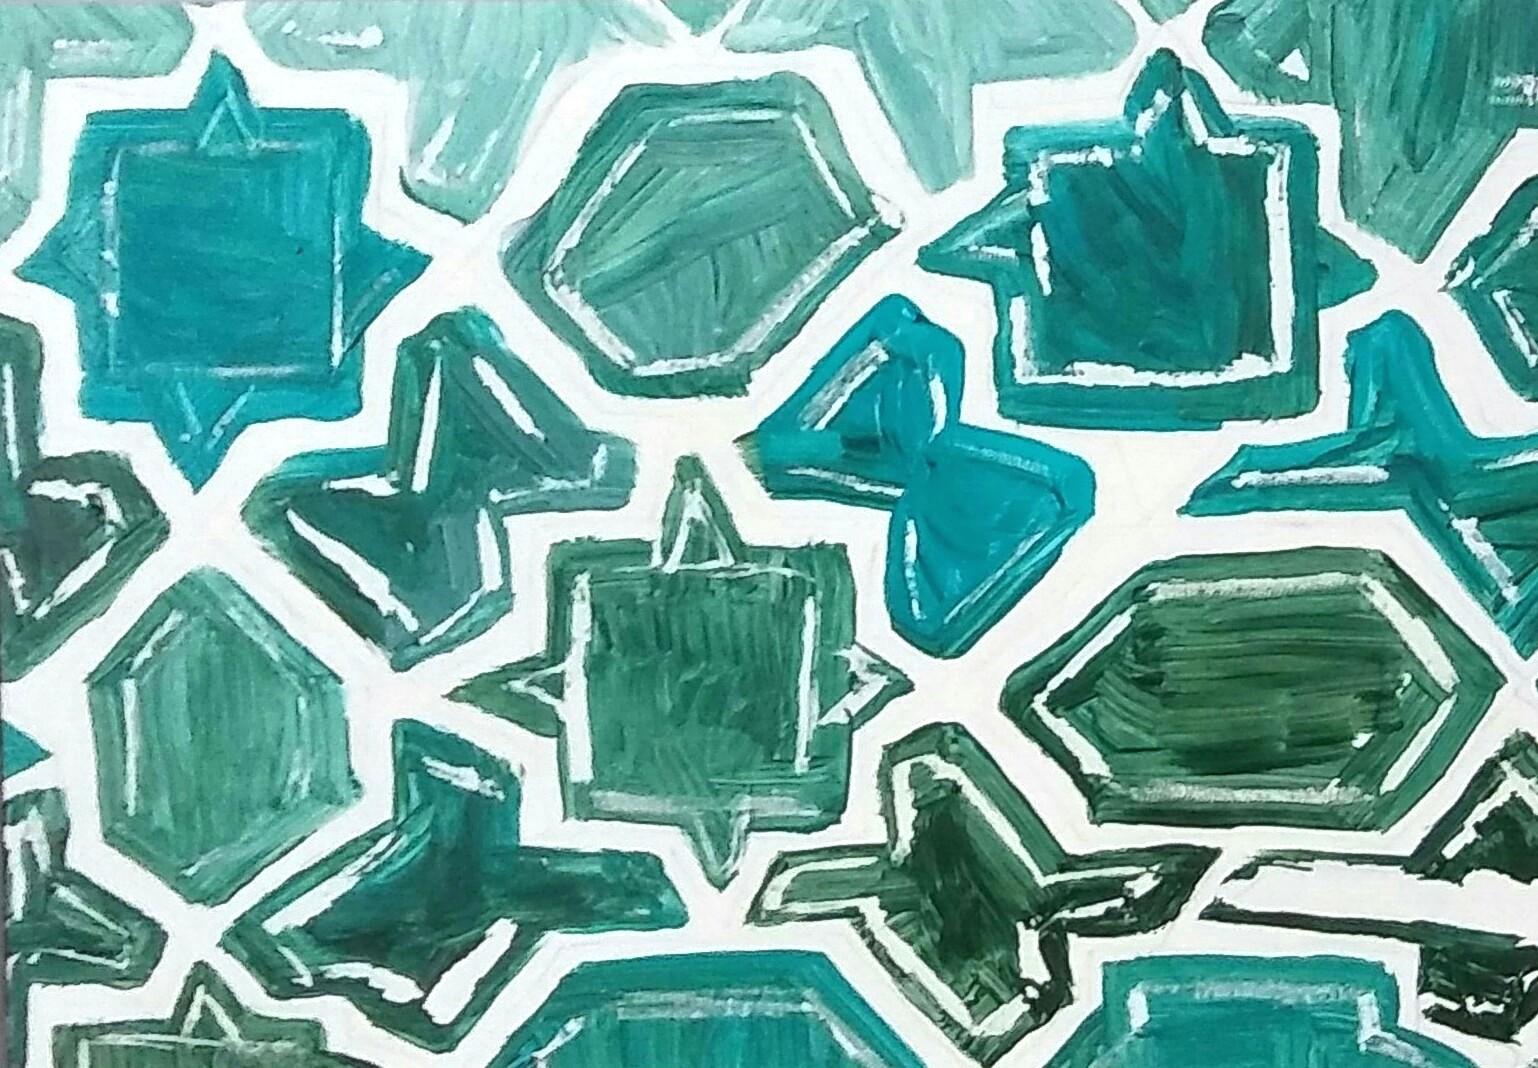 Turquoise shapes